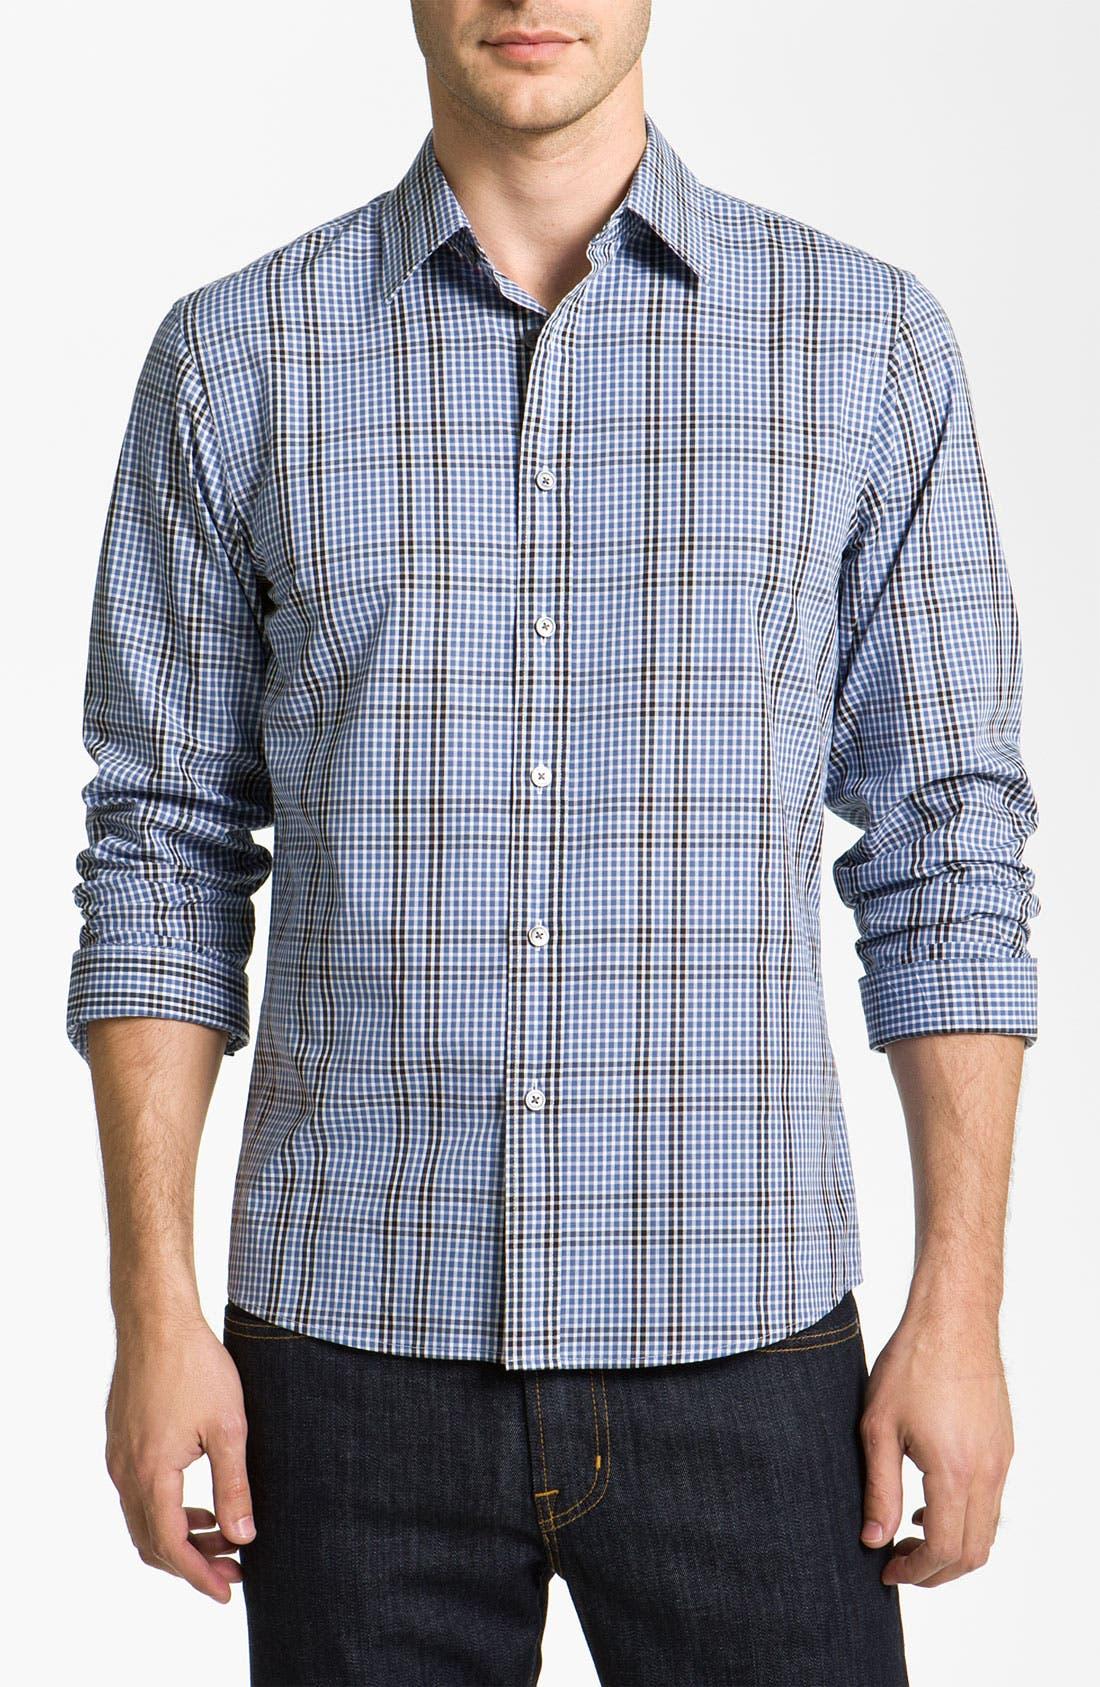 Main Image - Michael Kors 'Spalding' Check Woven Shirt